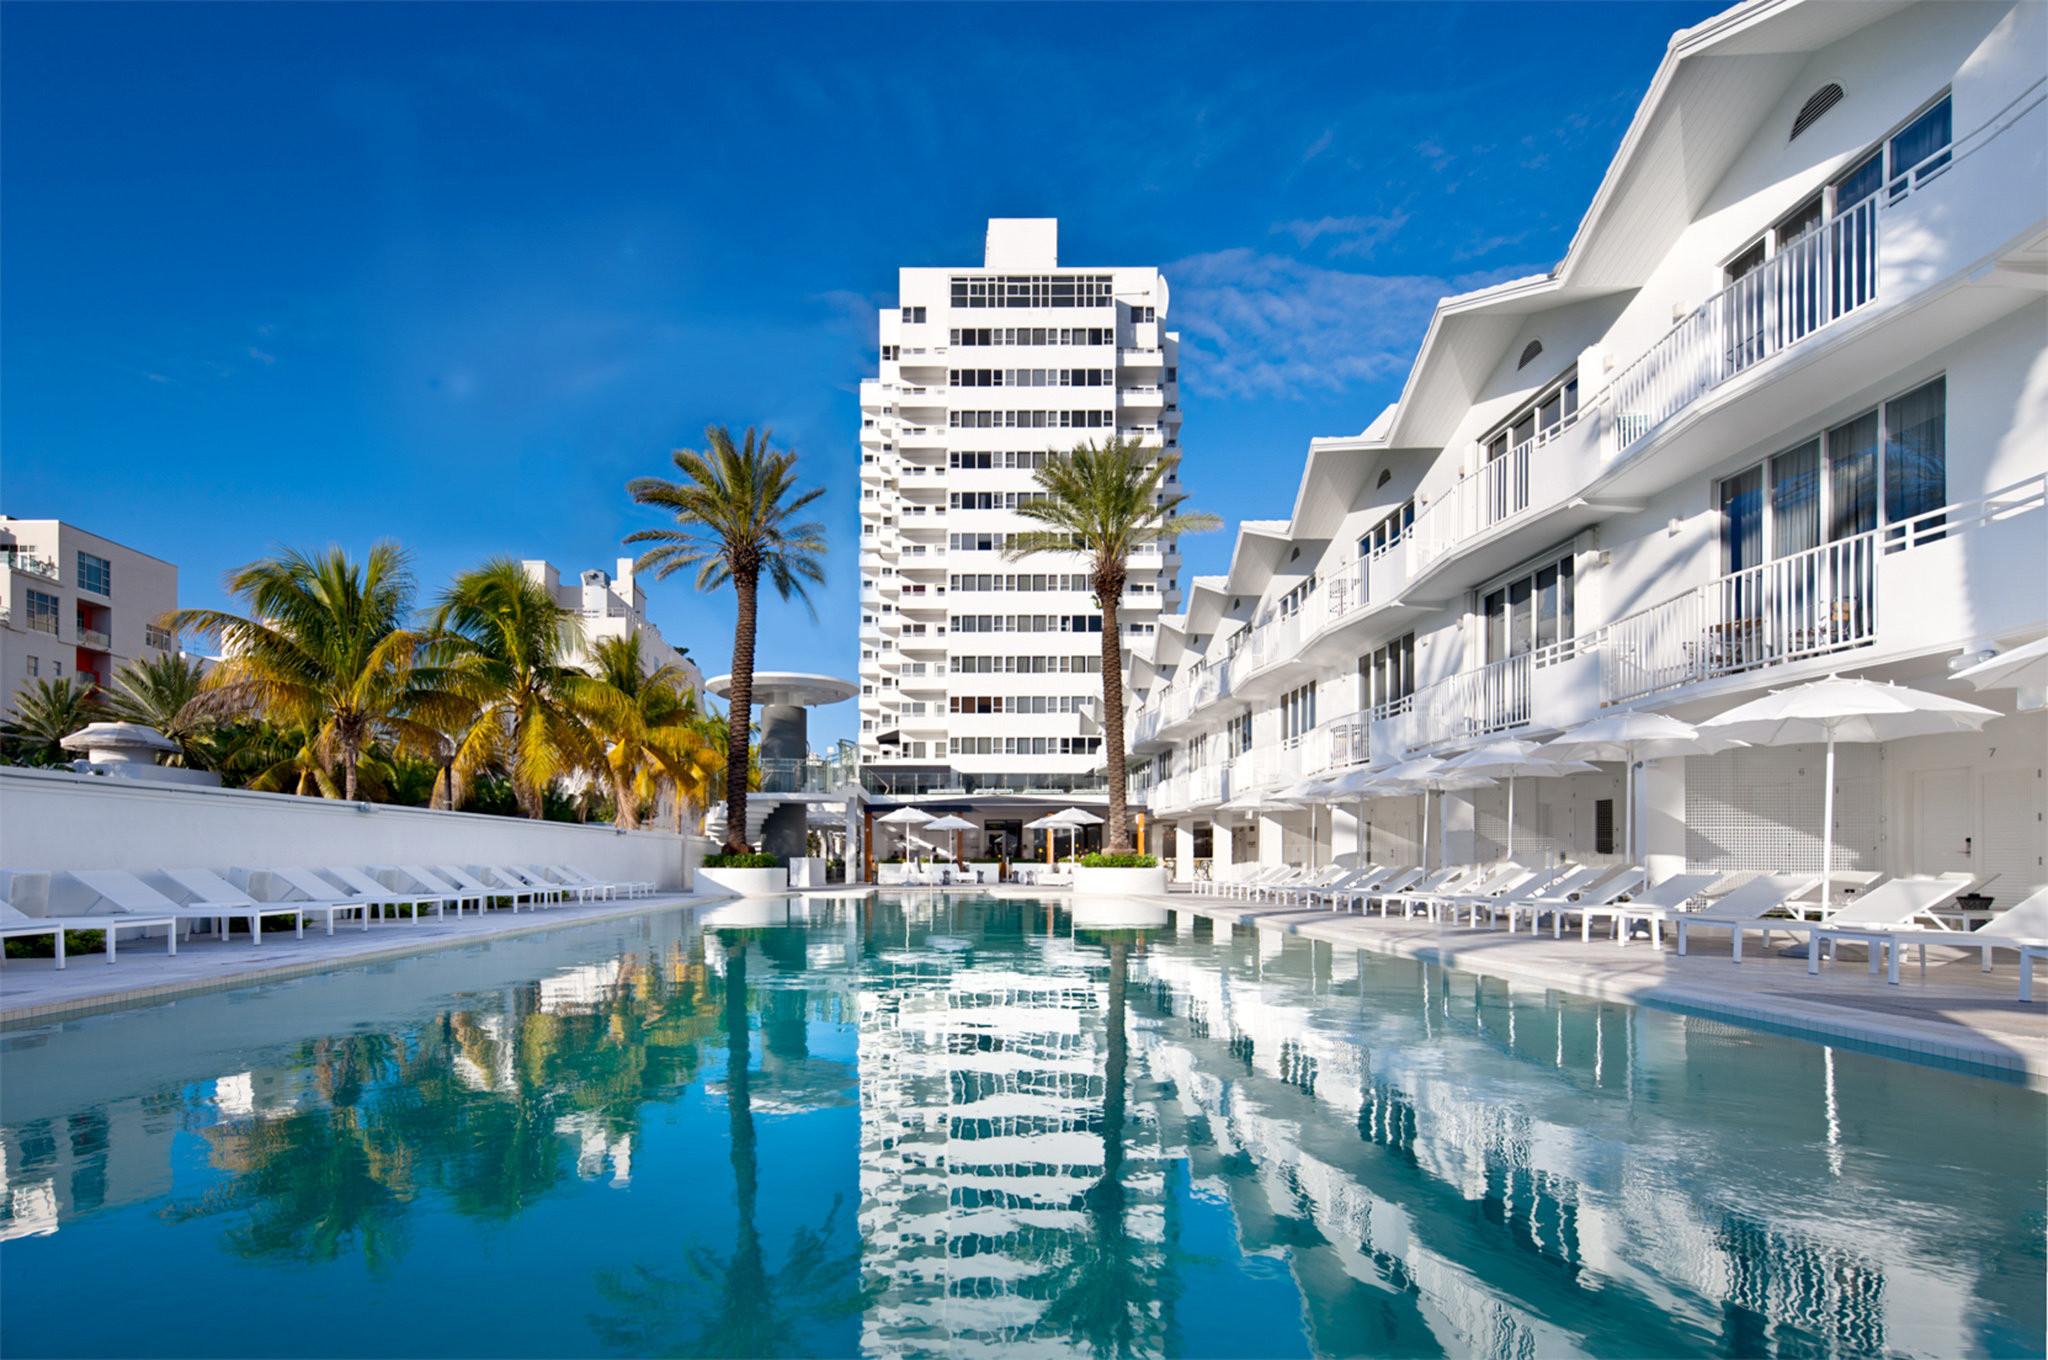 South Beach Miami Wallpaper HD 1080p